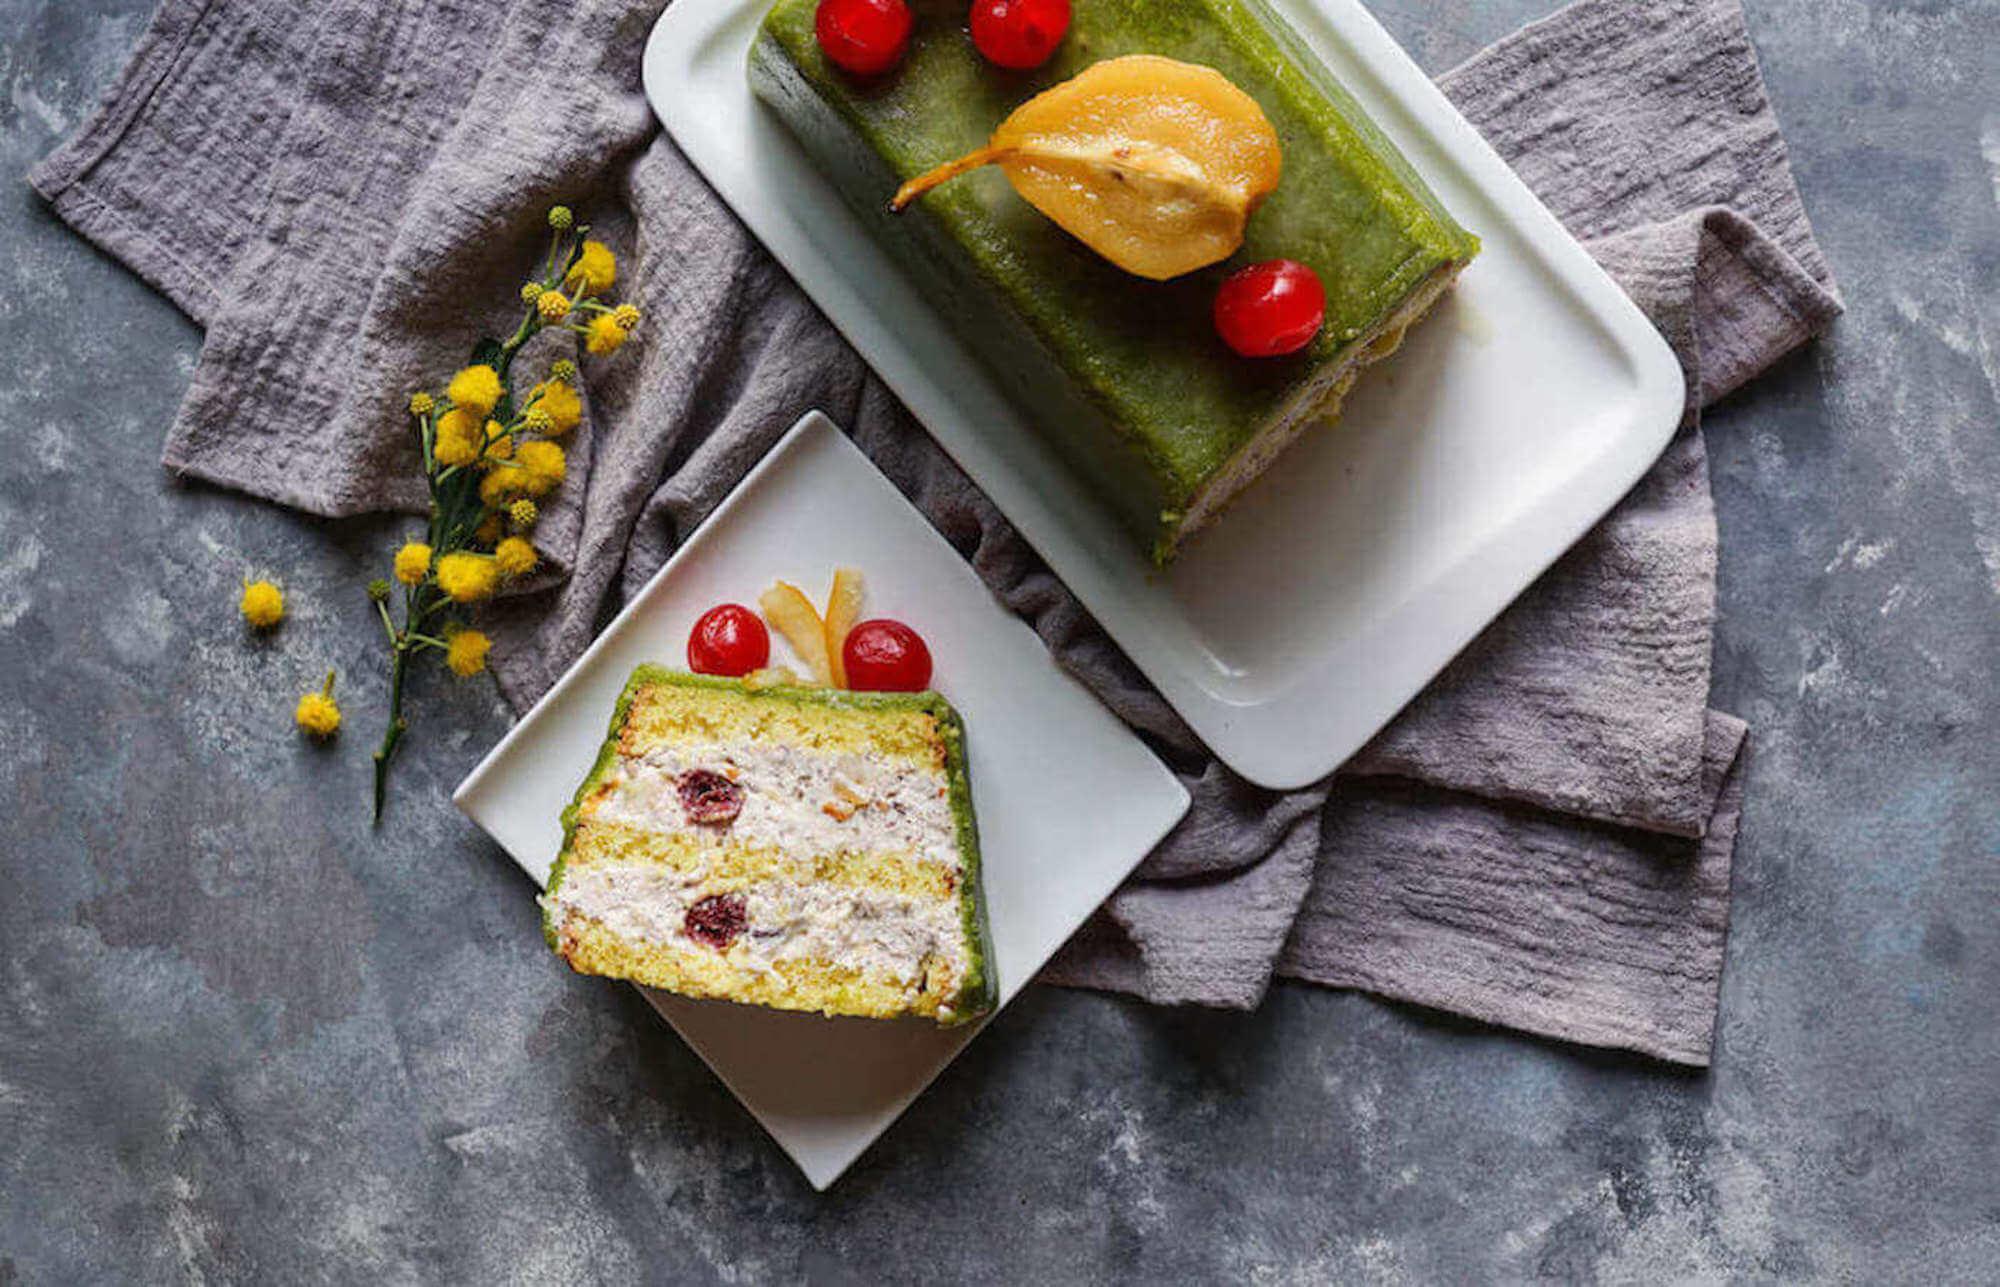 Italian Desserts: Cassata